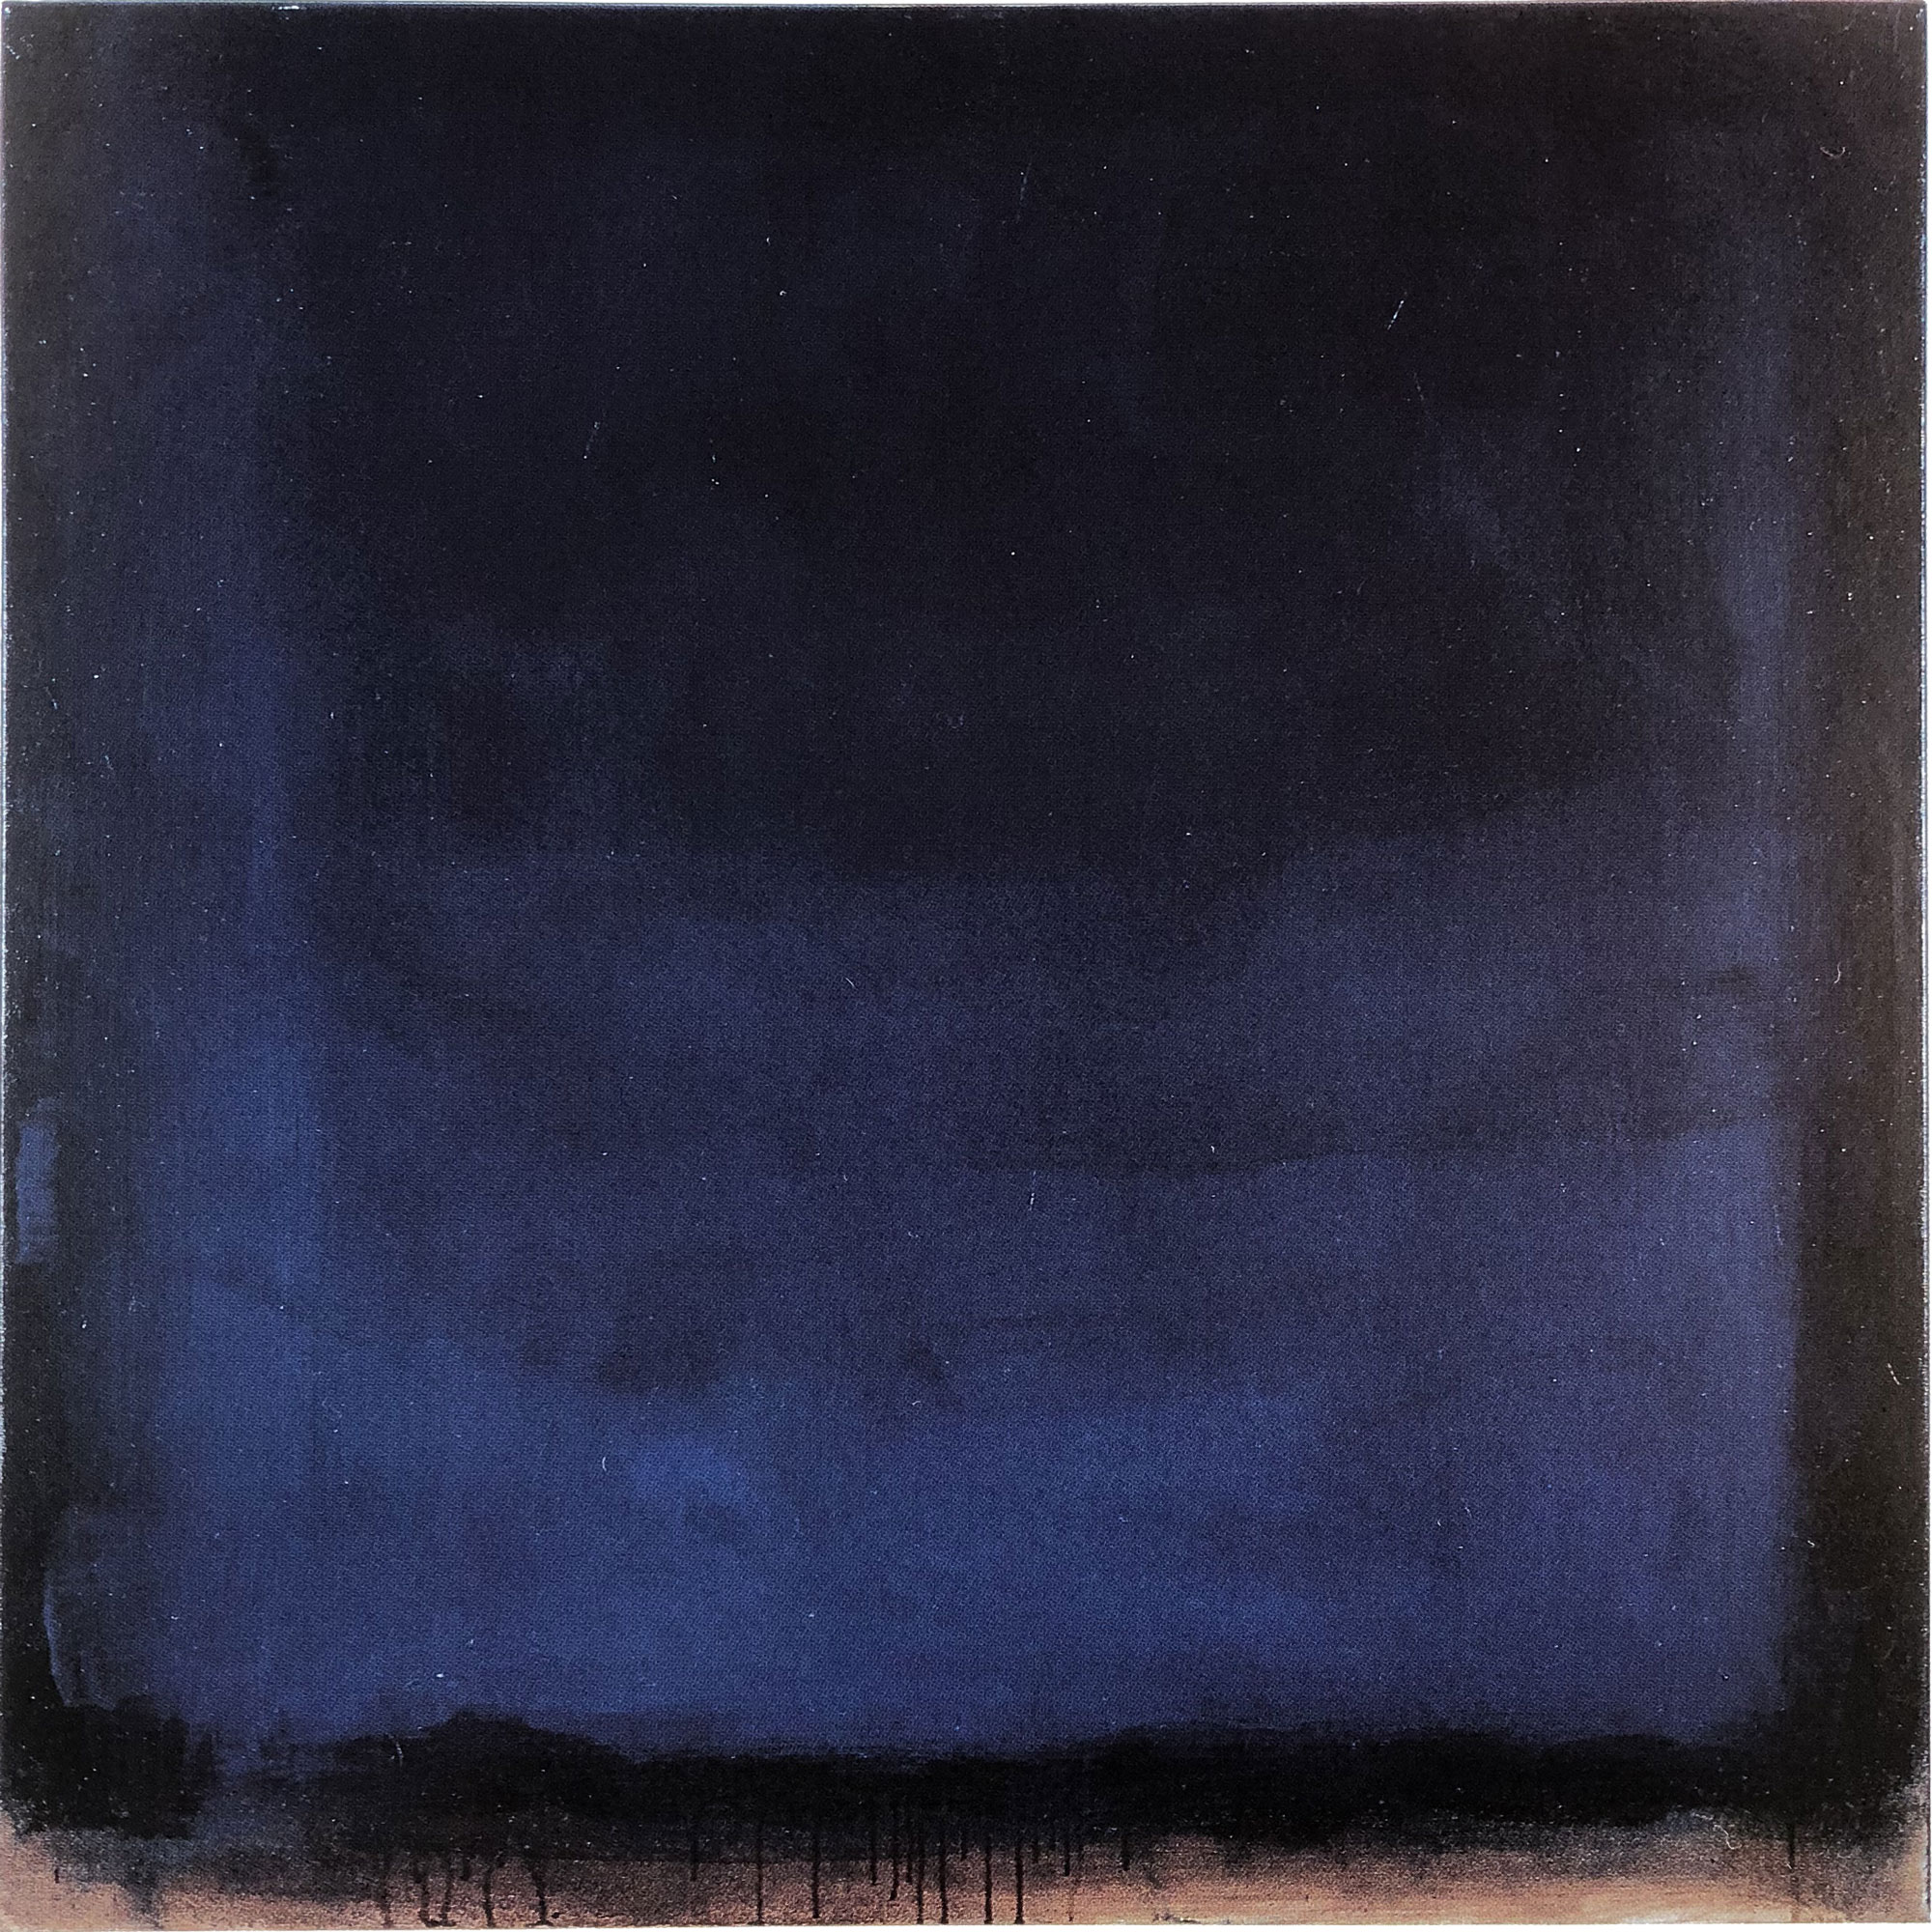 Monochrom-ohne-Titel-11-Öl-auf-Leinwand-120×120-1995